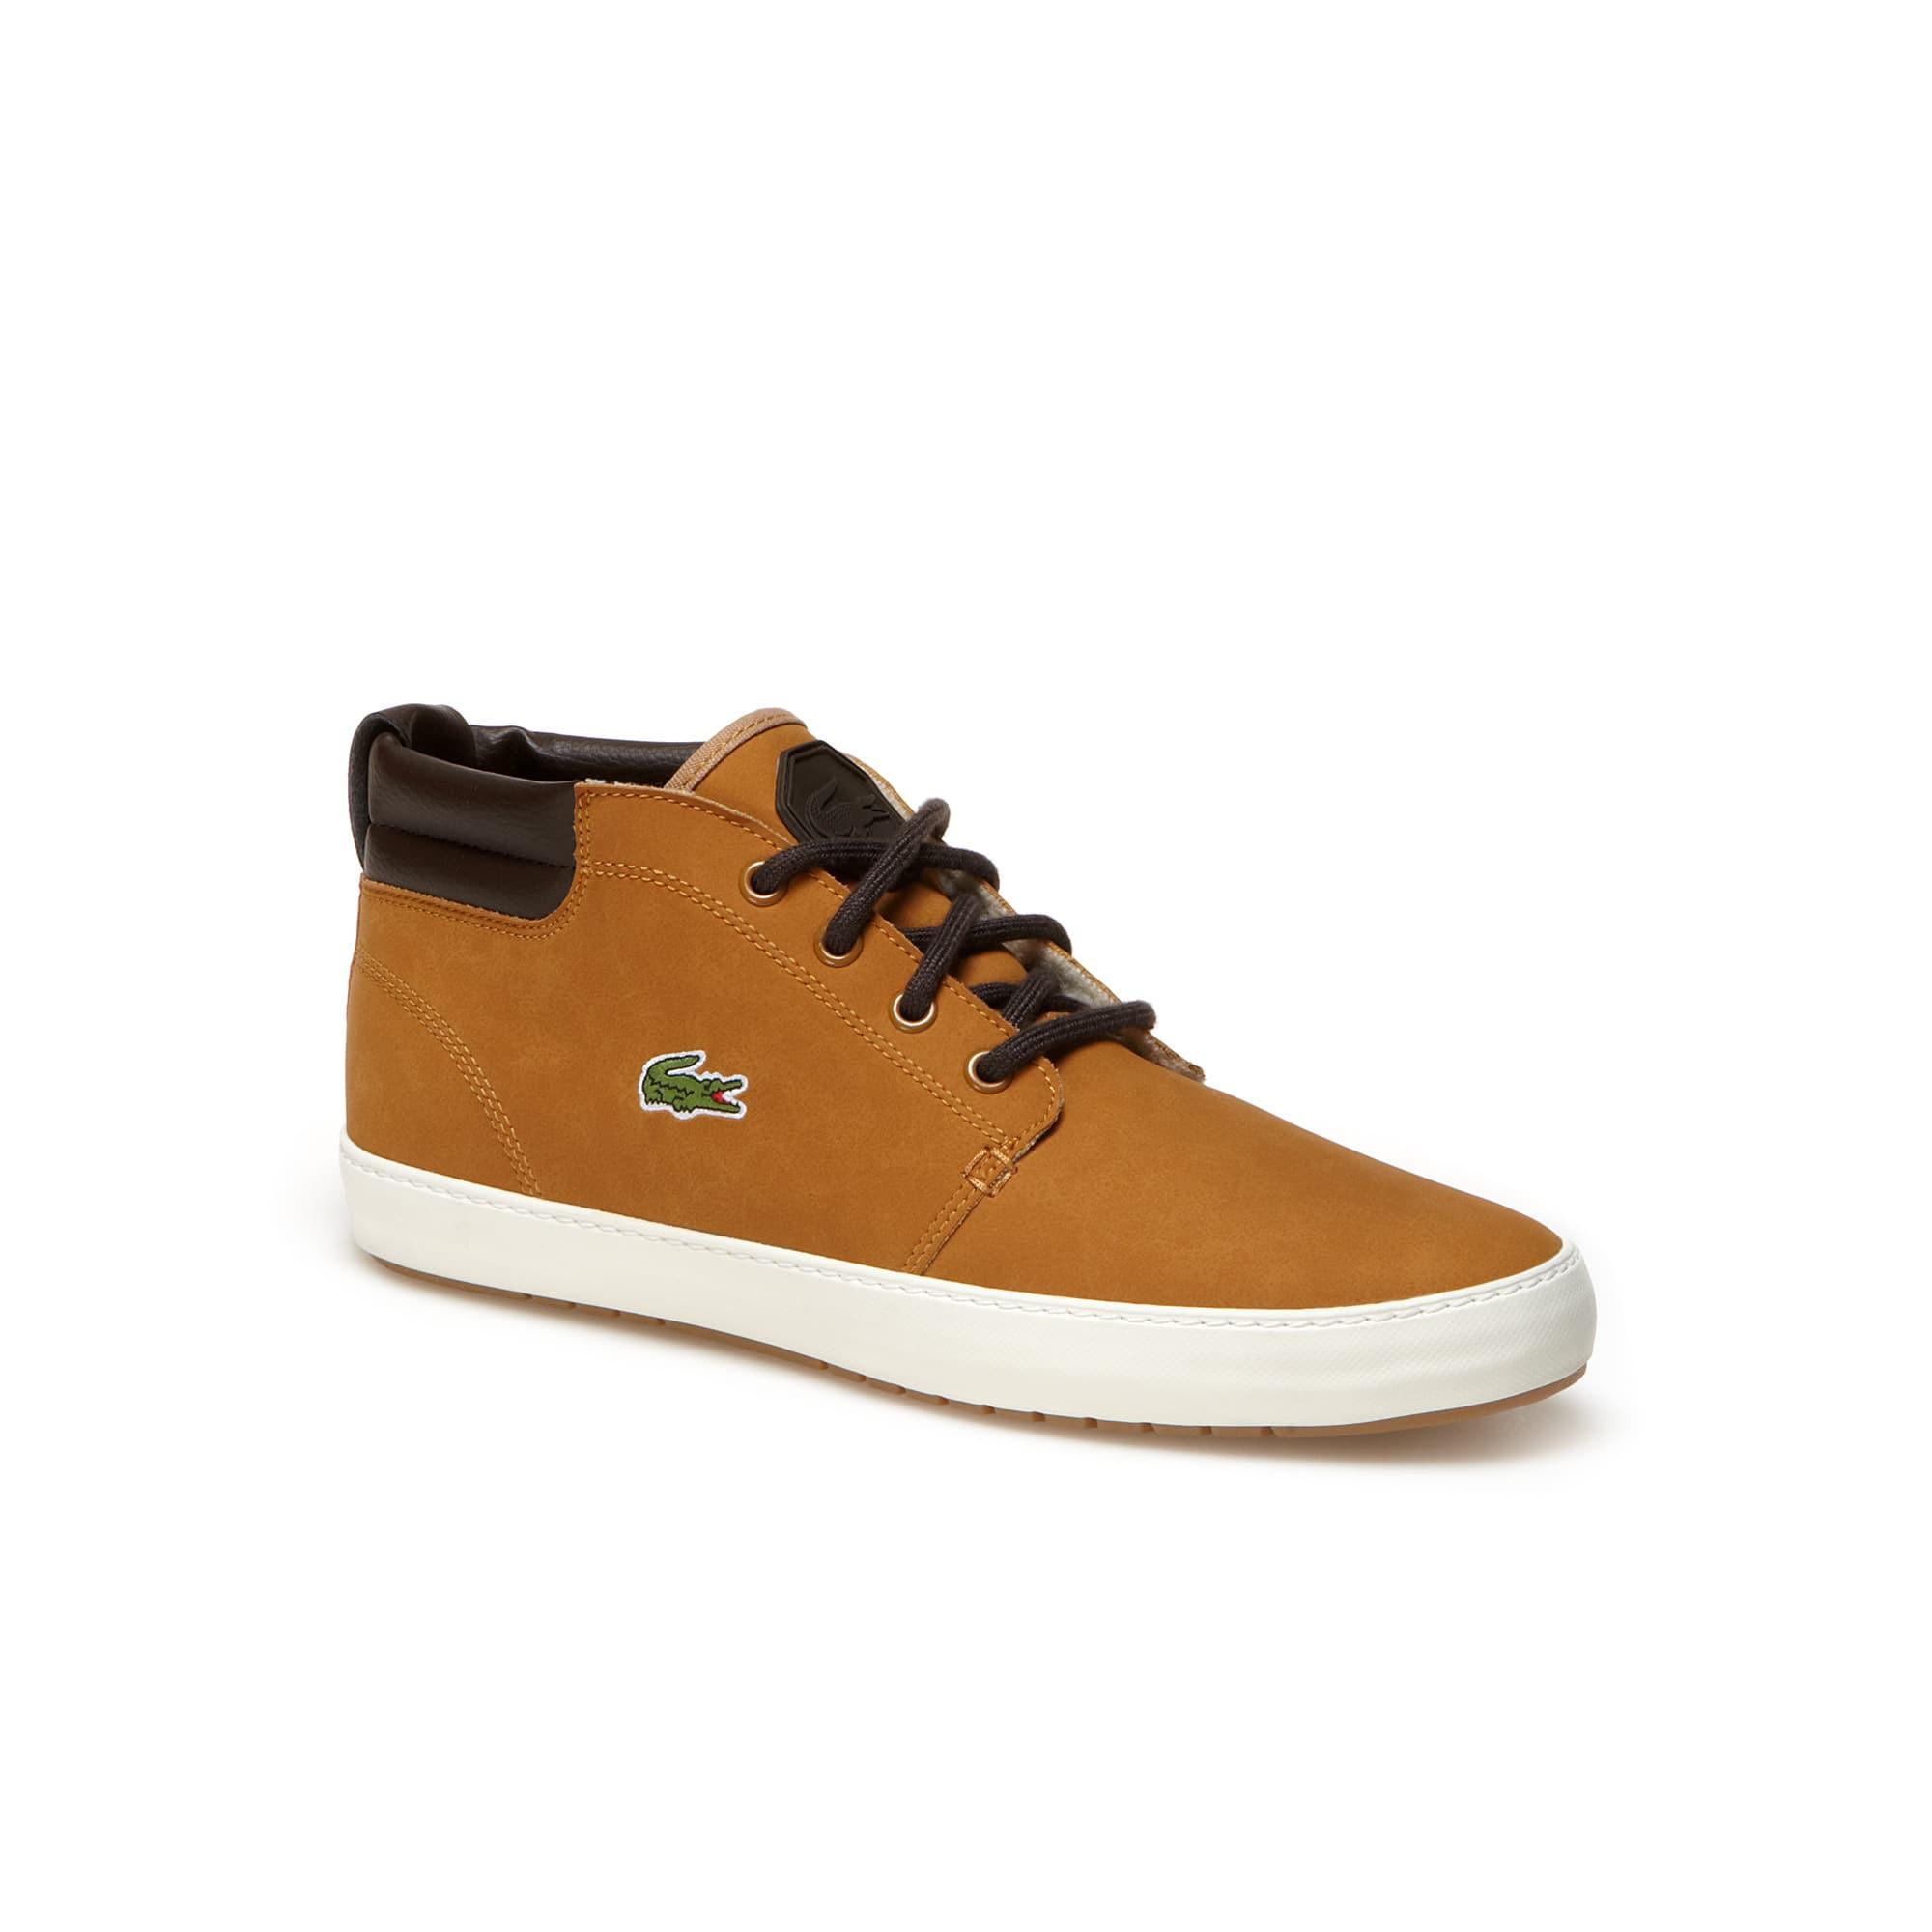 Halbhohe Herren-Sneakers AMPTHILL TERRA aus Leder